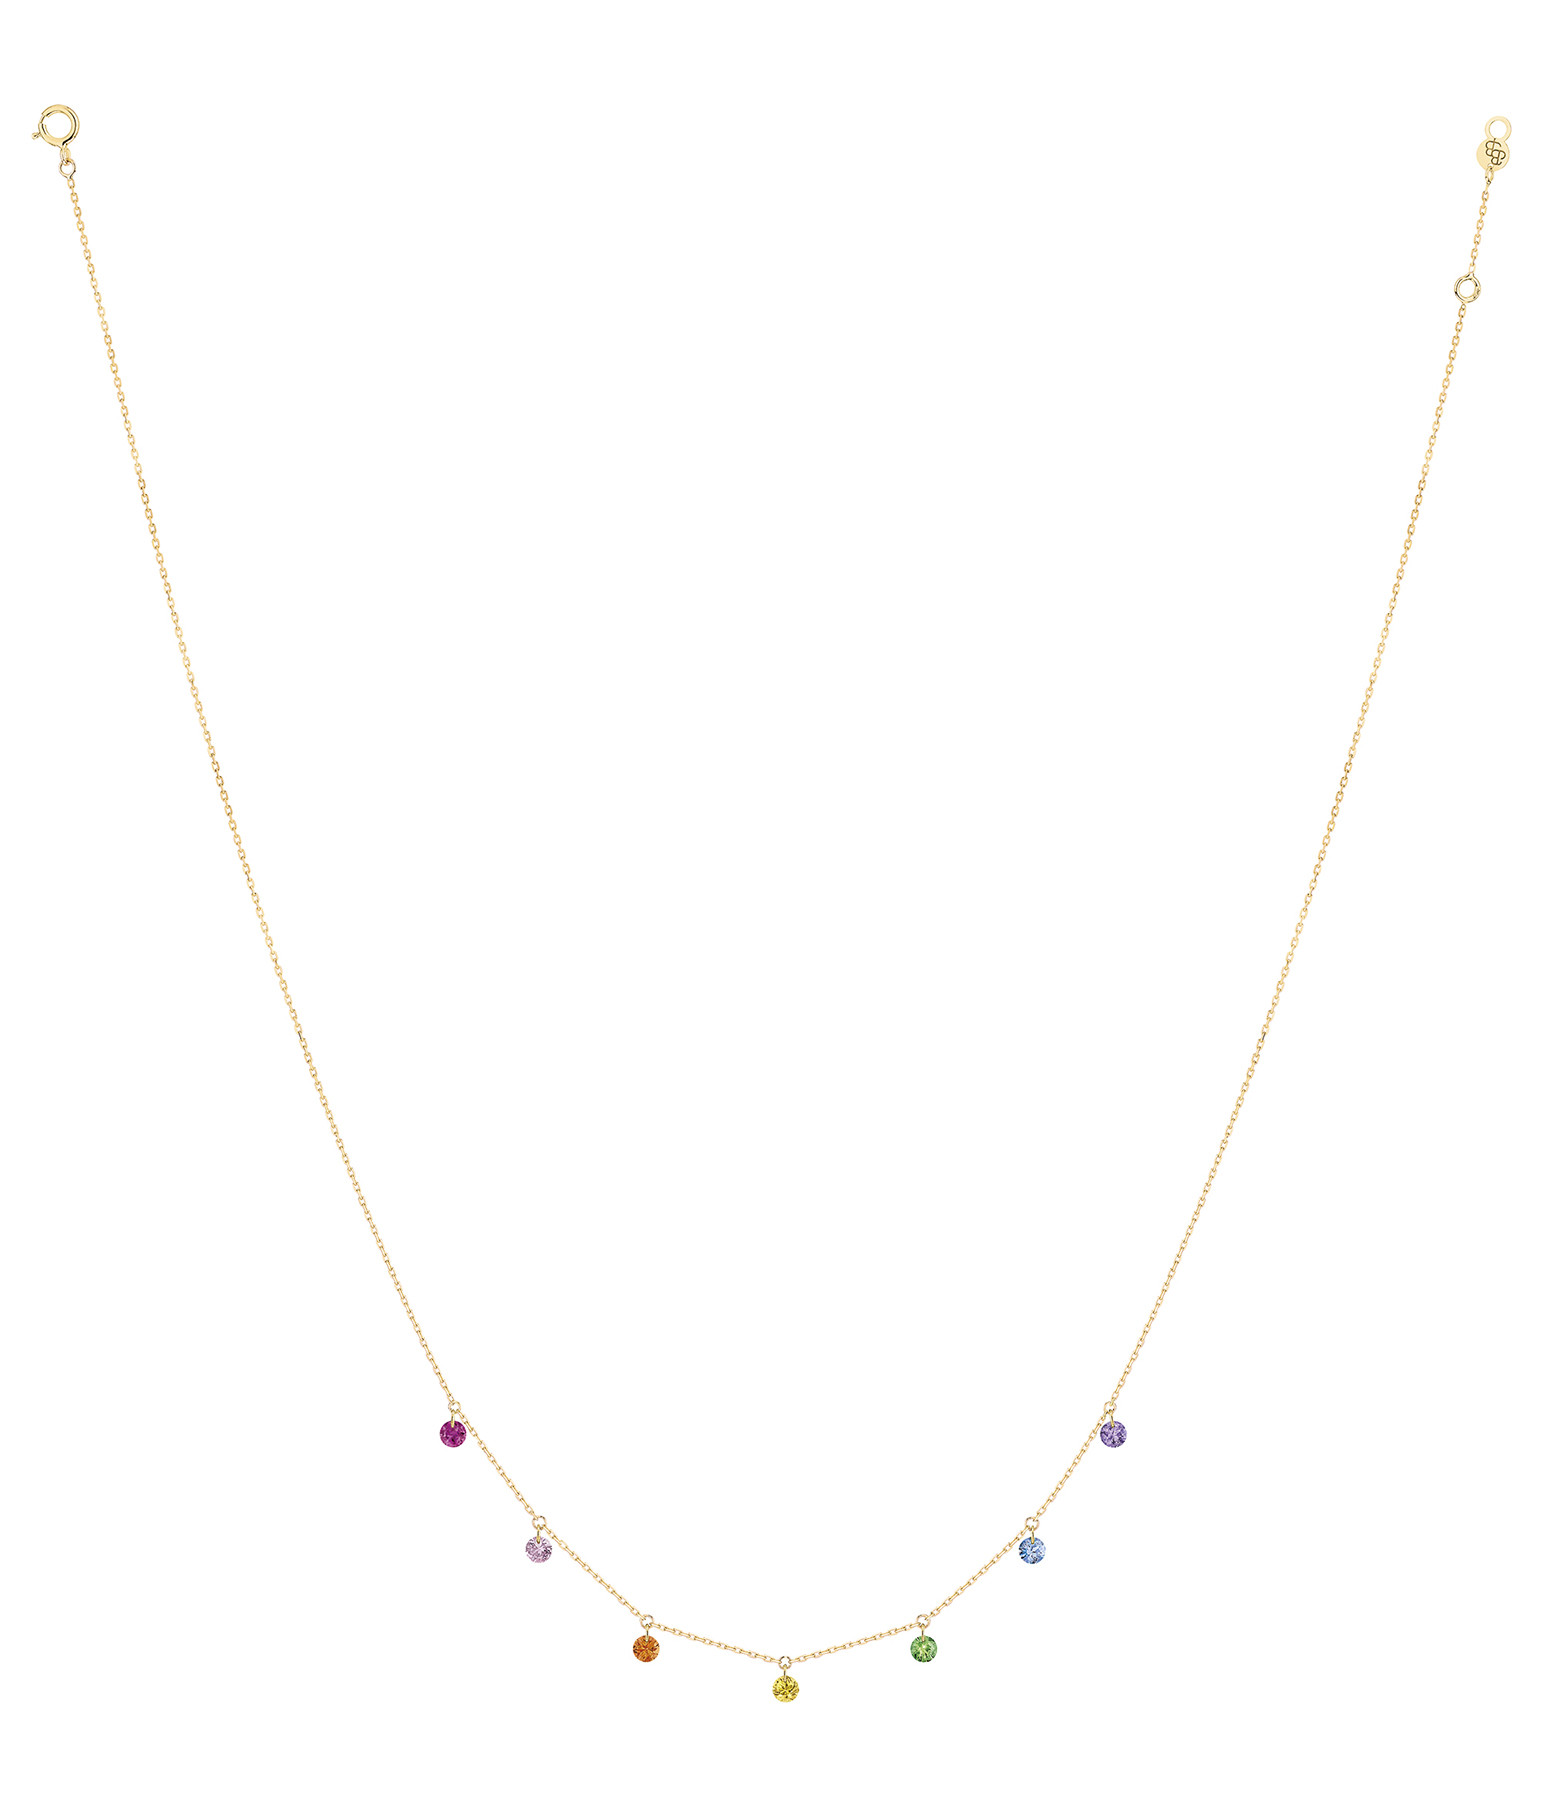 LA BRUNE & LA BLONDE - Collier Confetti 7 Rubis Saphir Tsavorite Améthyste Or Jaune